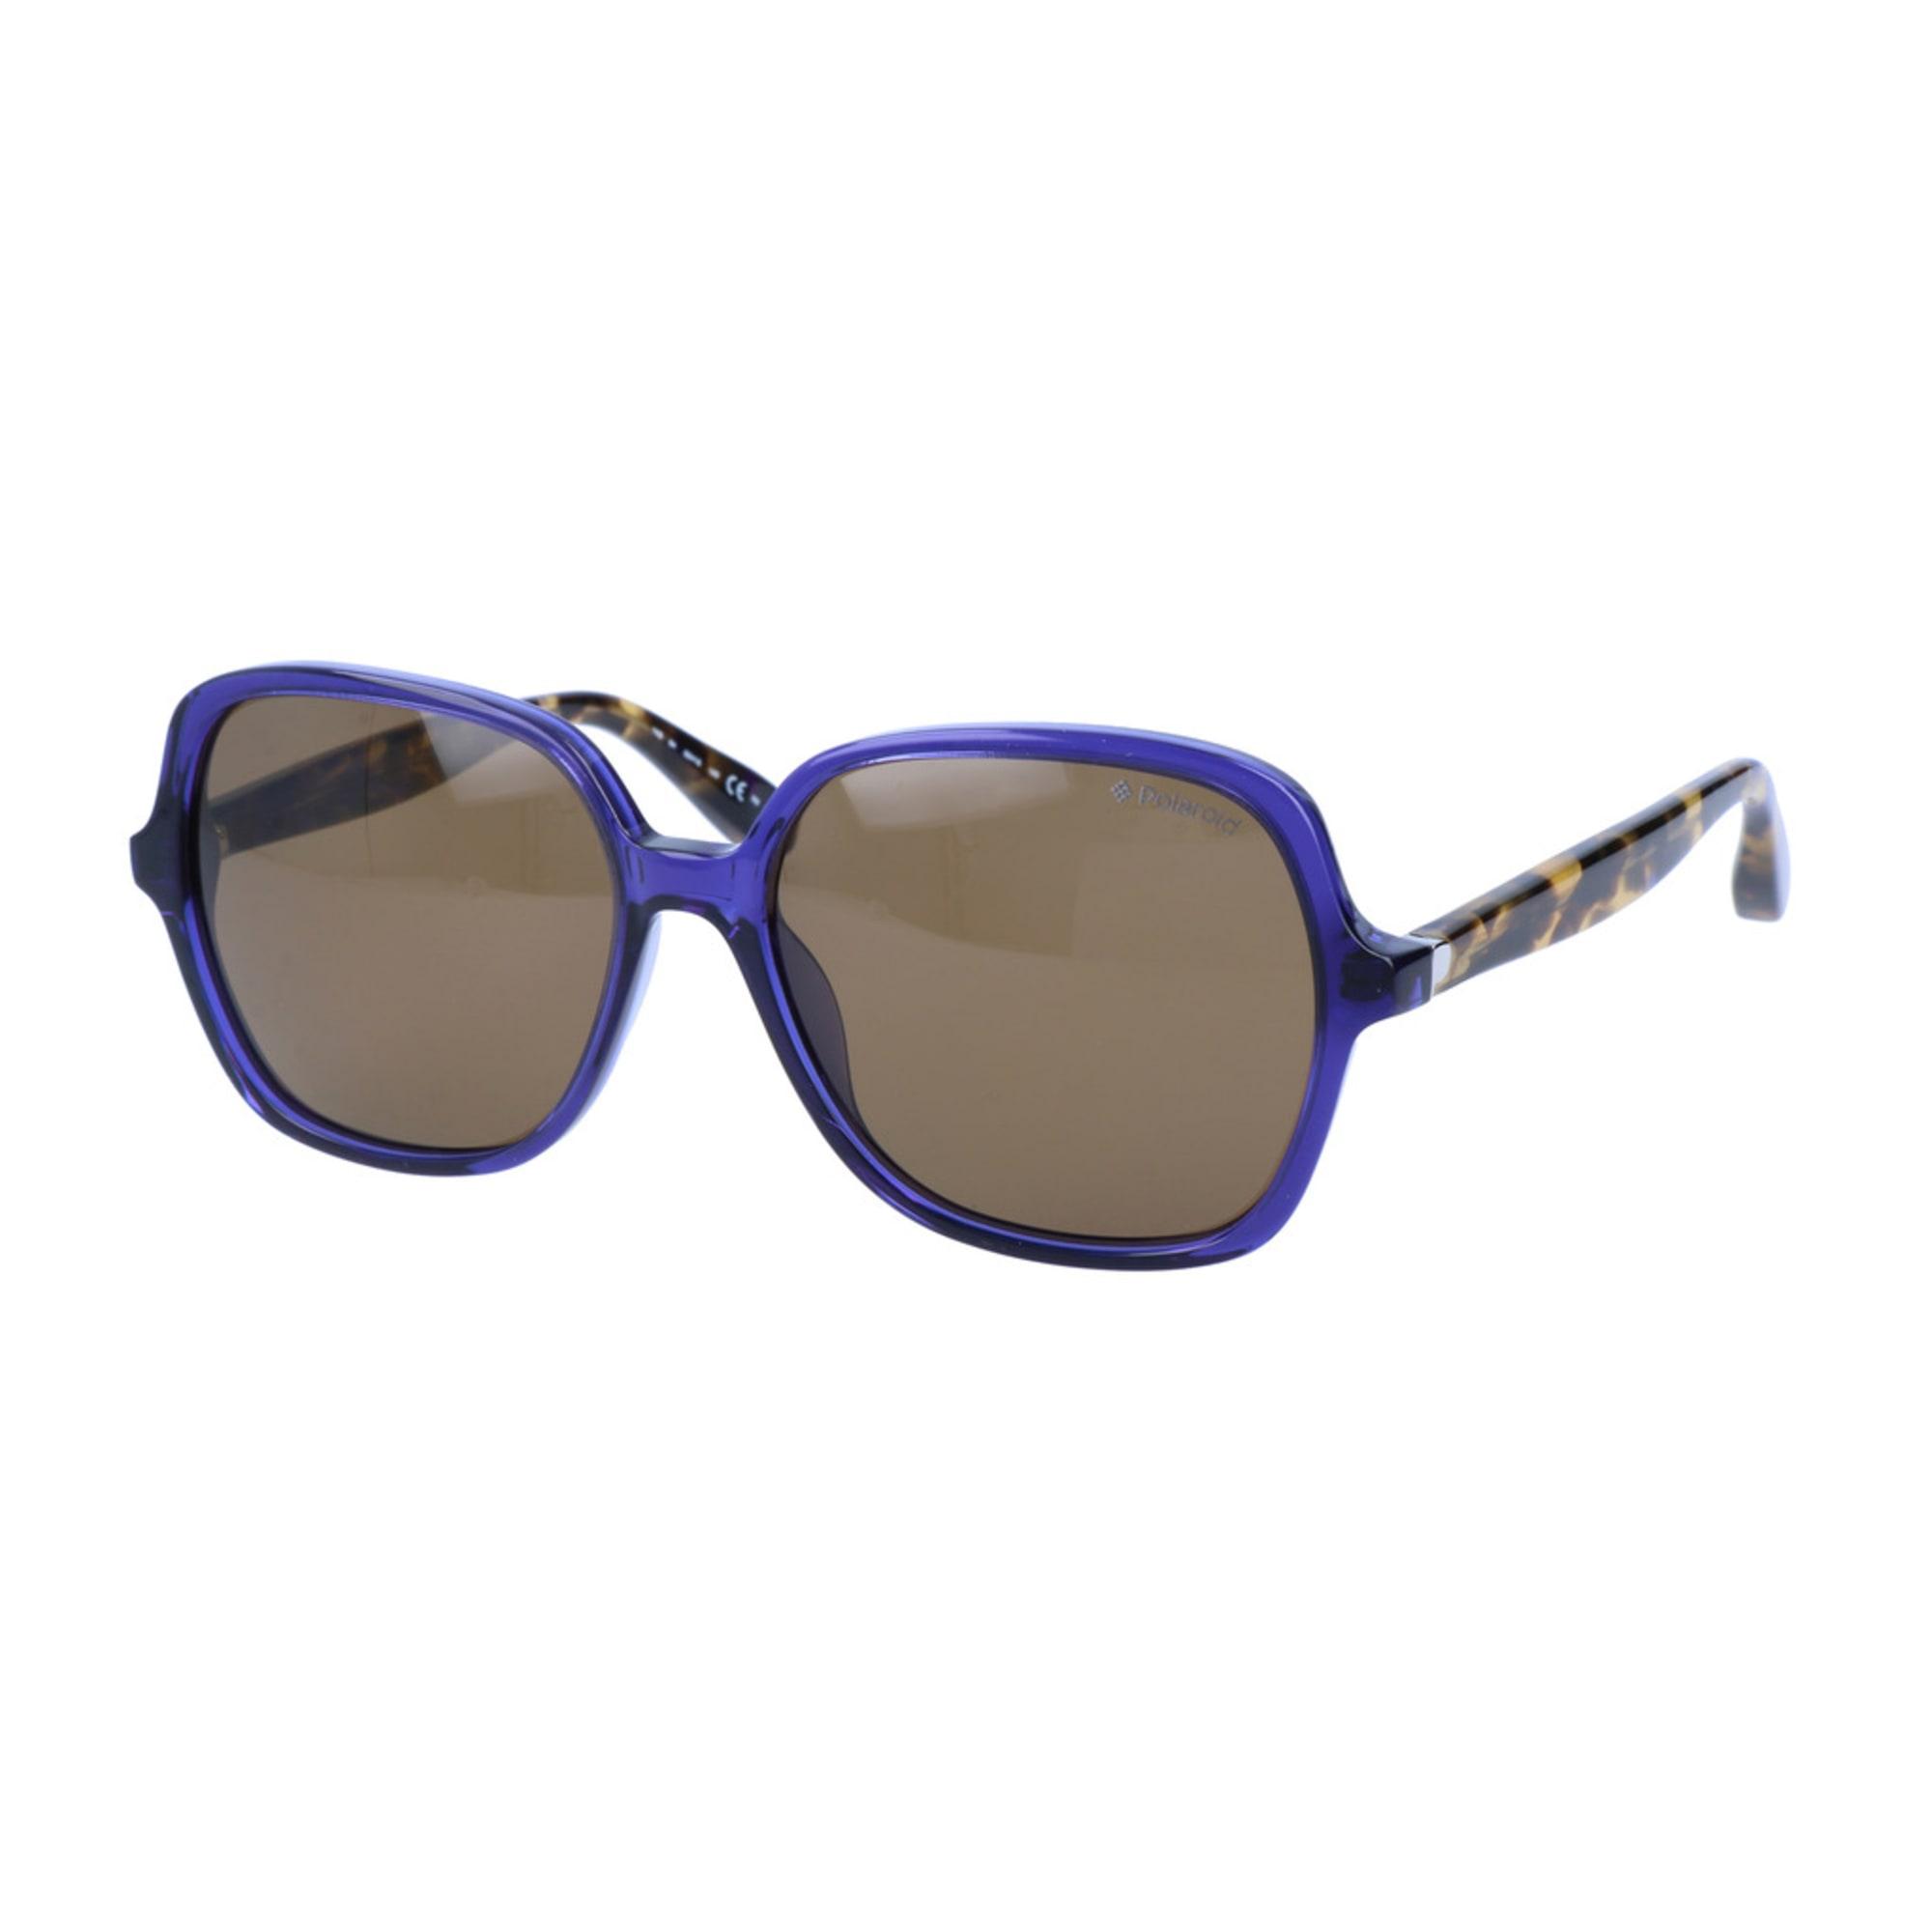 Lunettes de soleil POLAROID Bleu, bleu marine, bleu turquoise d4d0ecdf7243